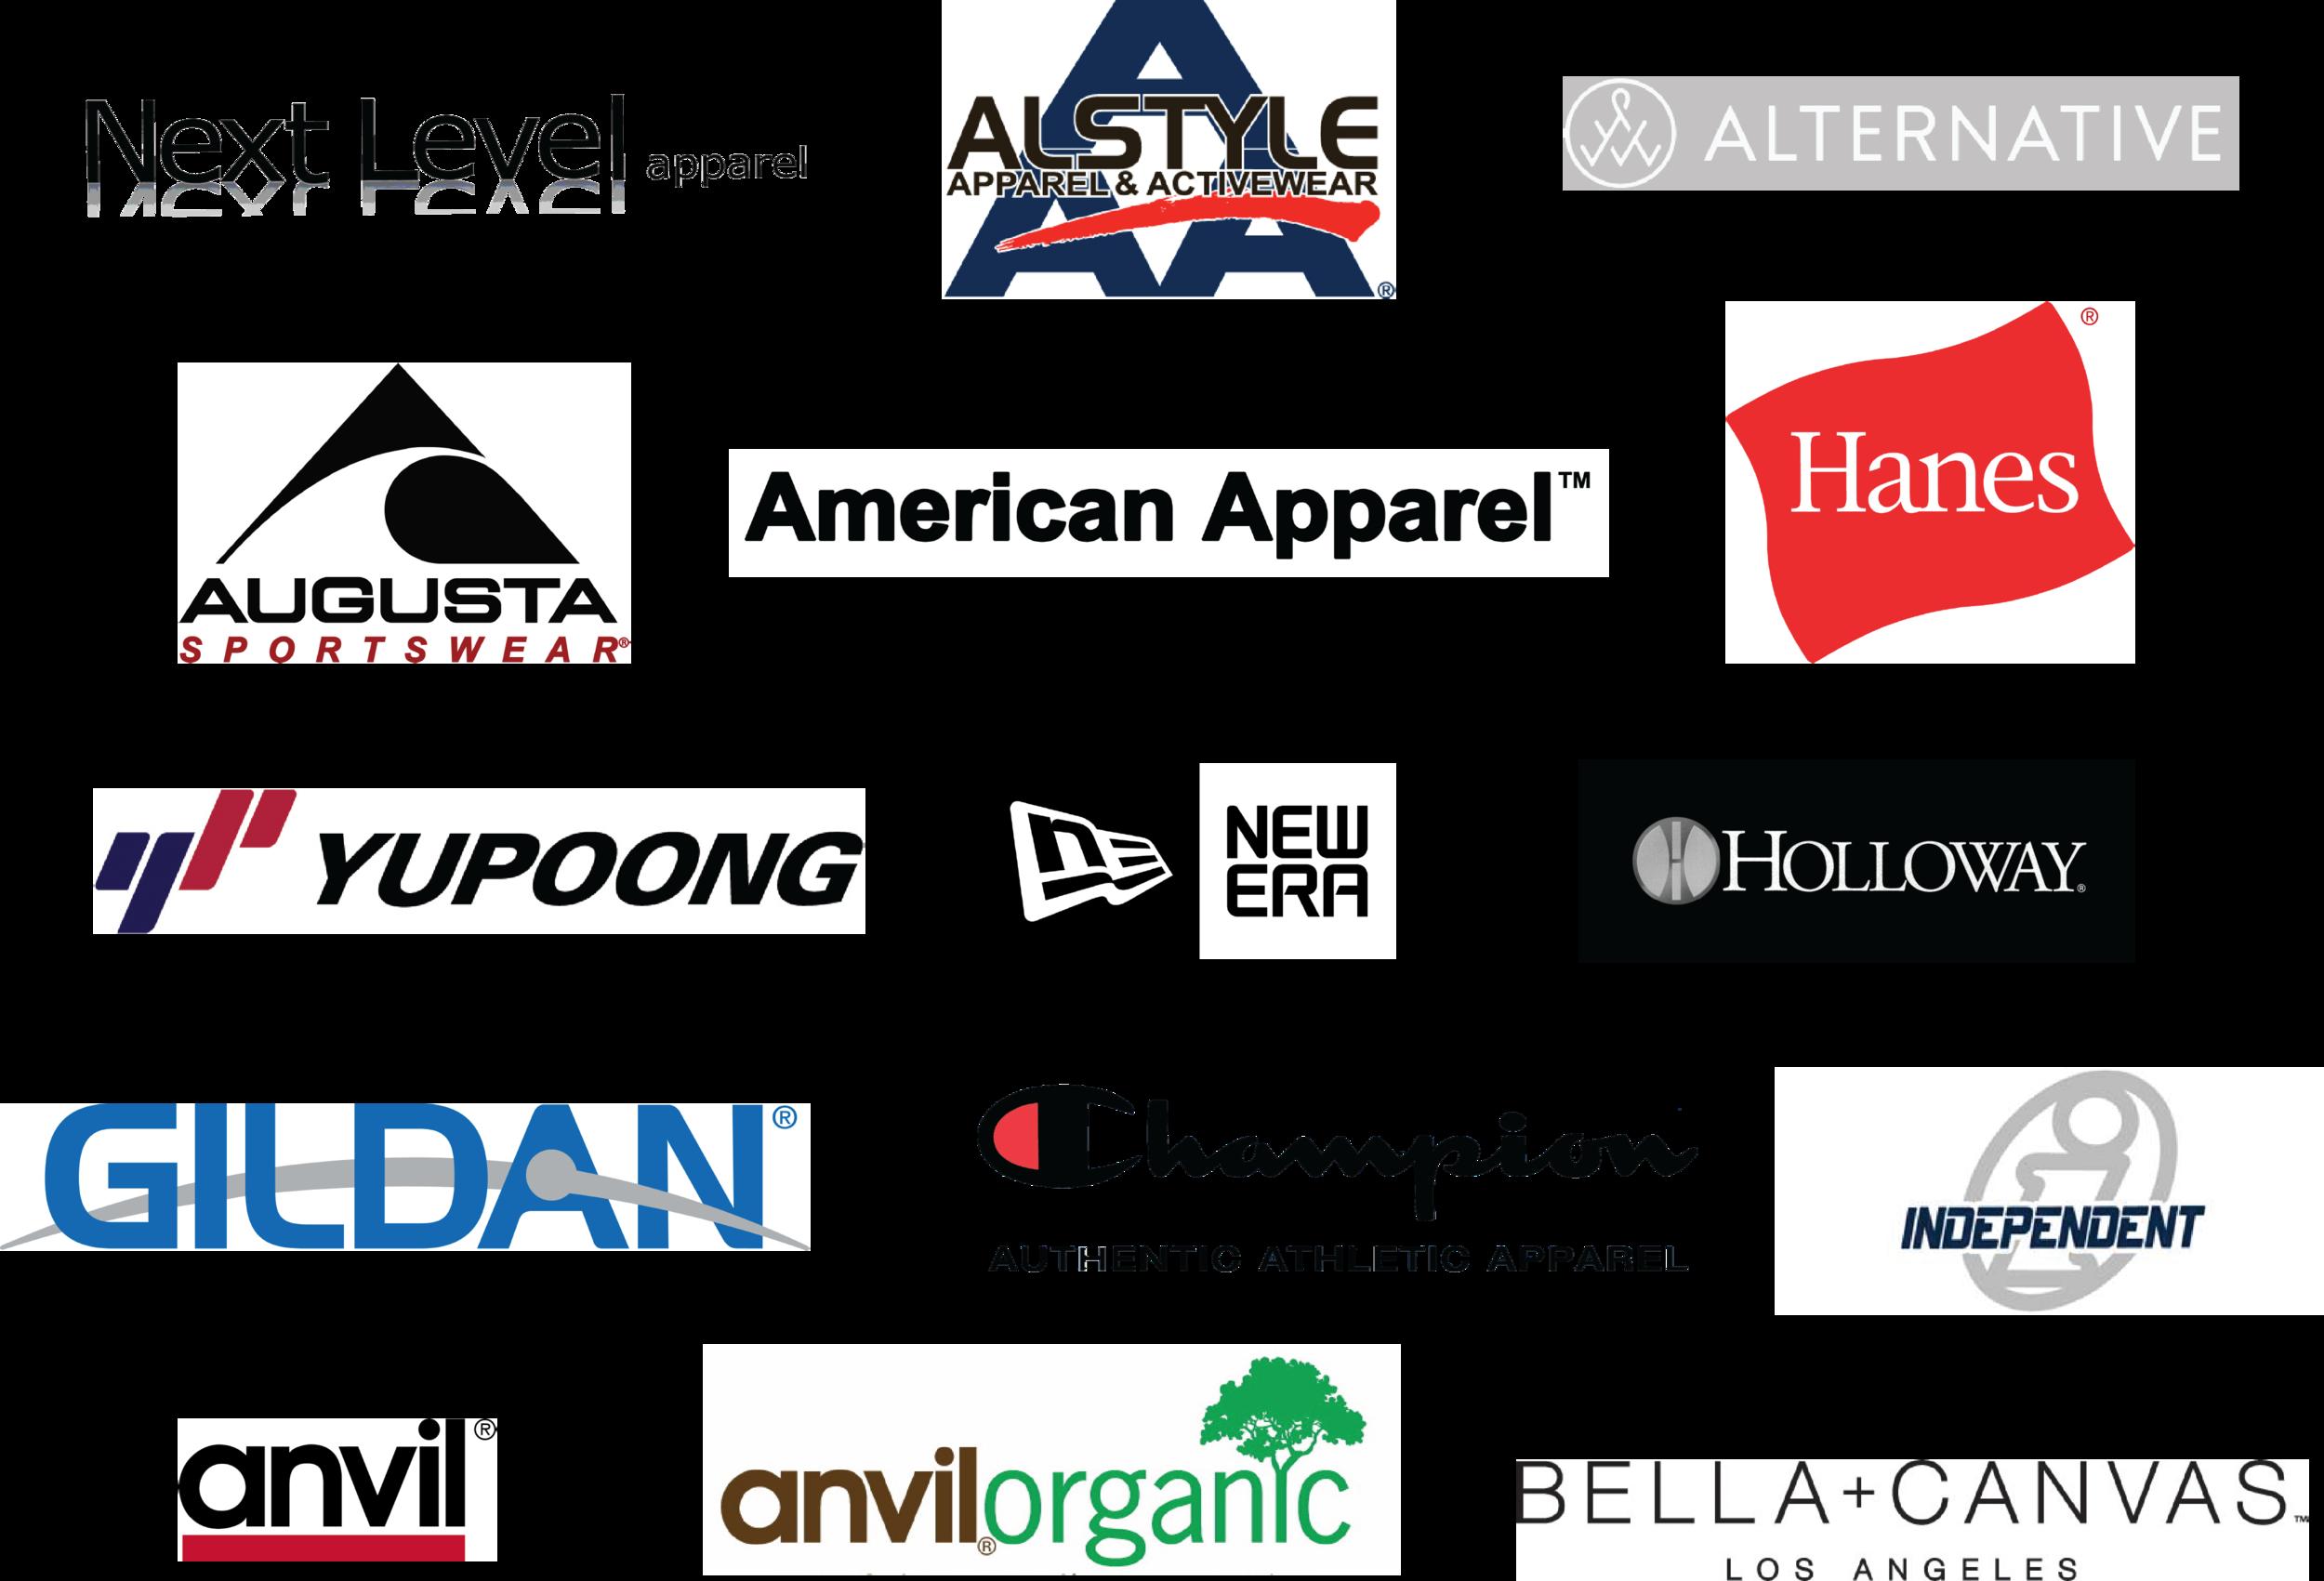 wholesalepartnerships.png